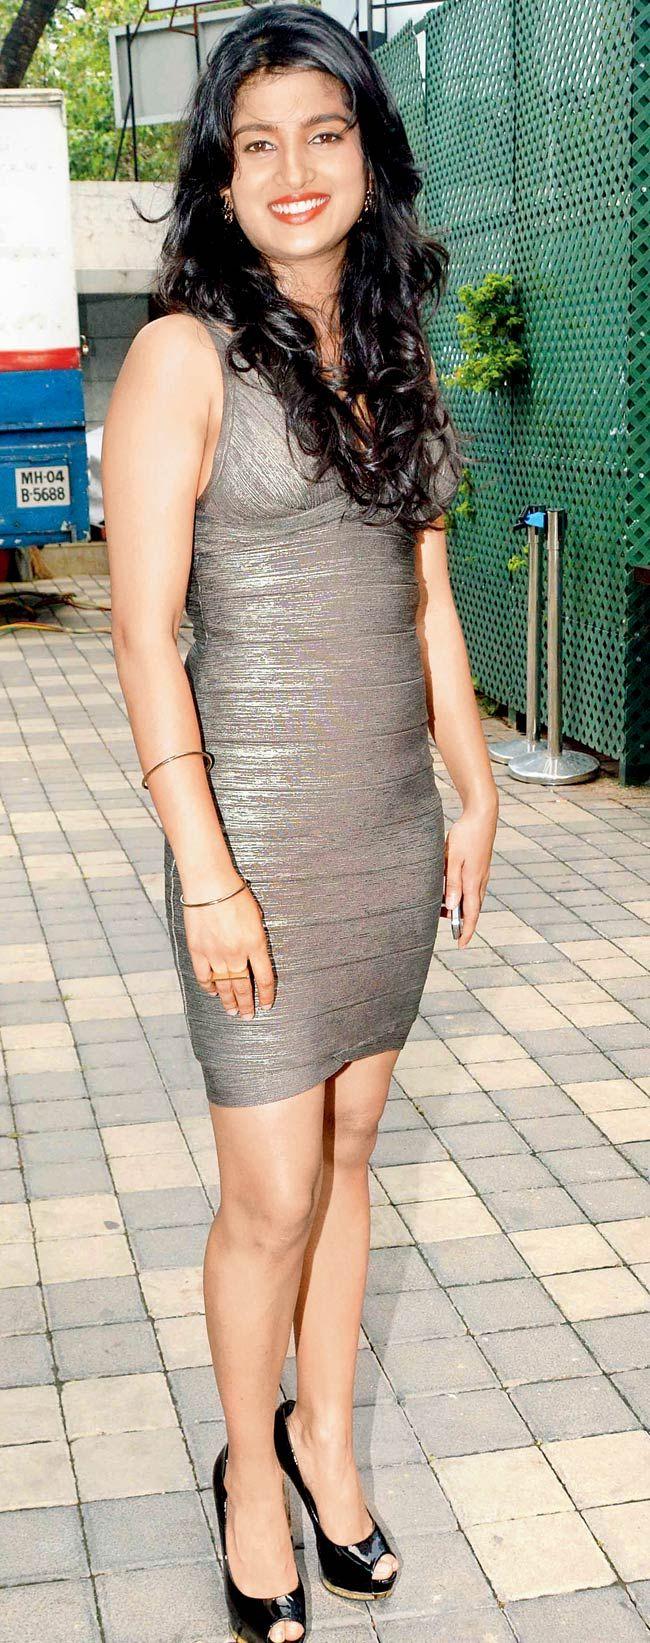 Vega Tamotia at music launch of 'Amit Sahni Ki List'. #Style #Bollywood #Fashion #Beauty